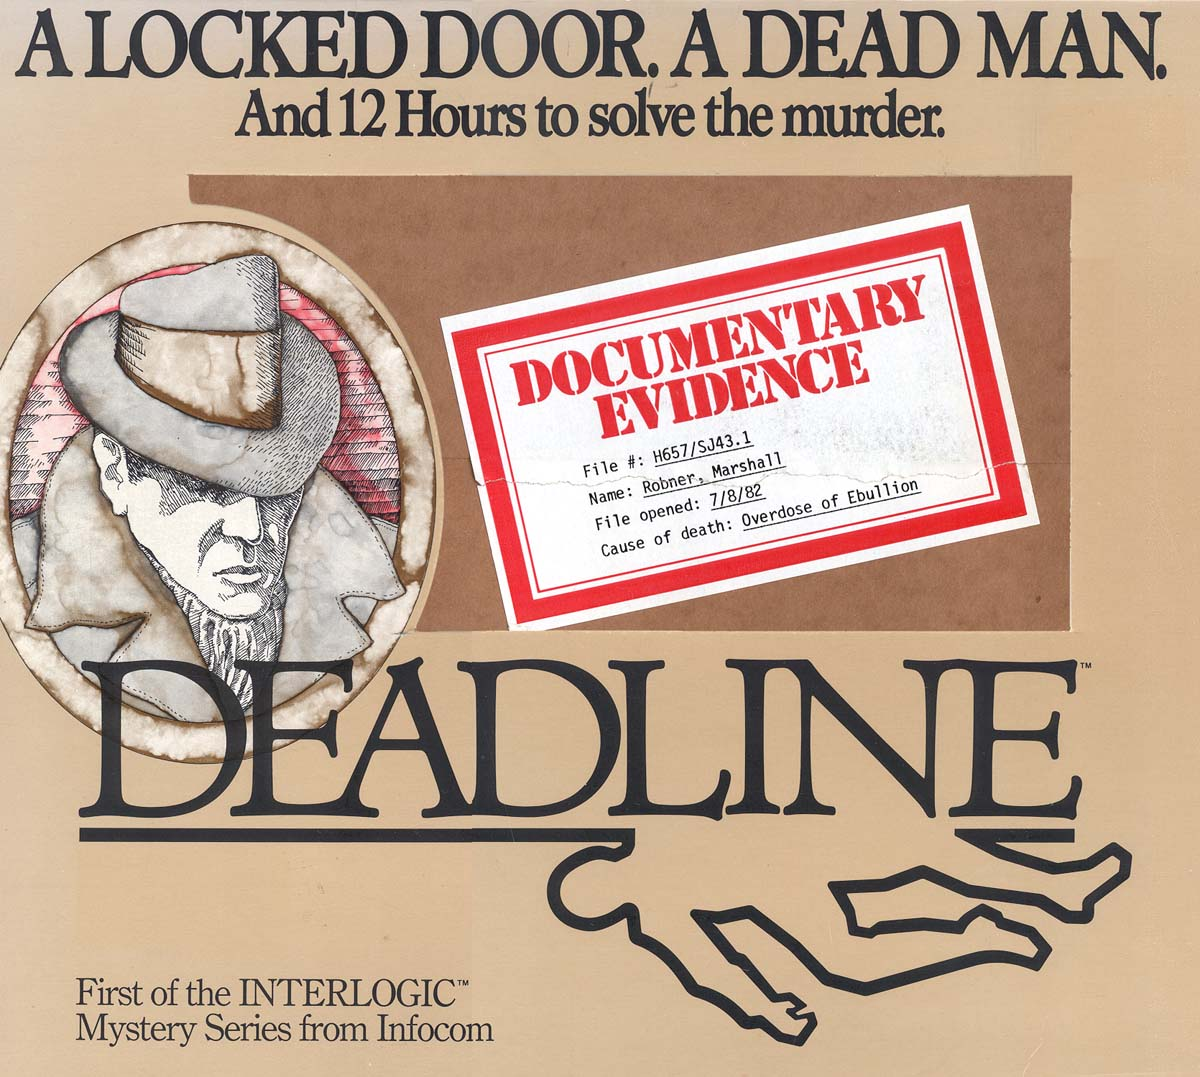 The original box art for Infocom's Deadline